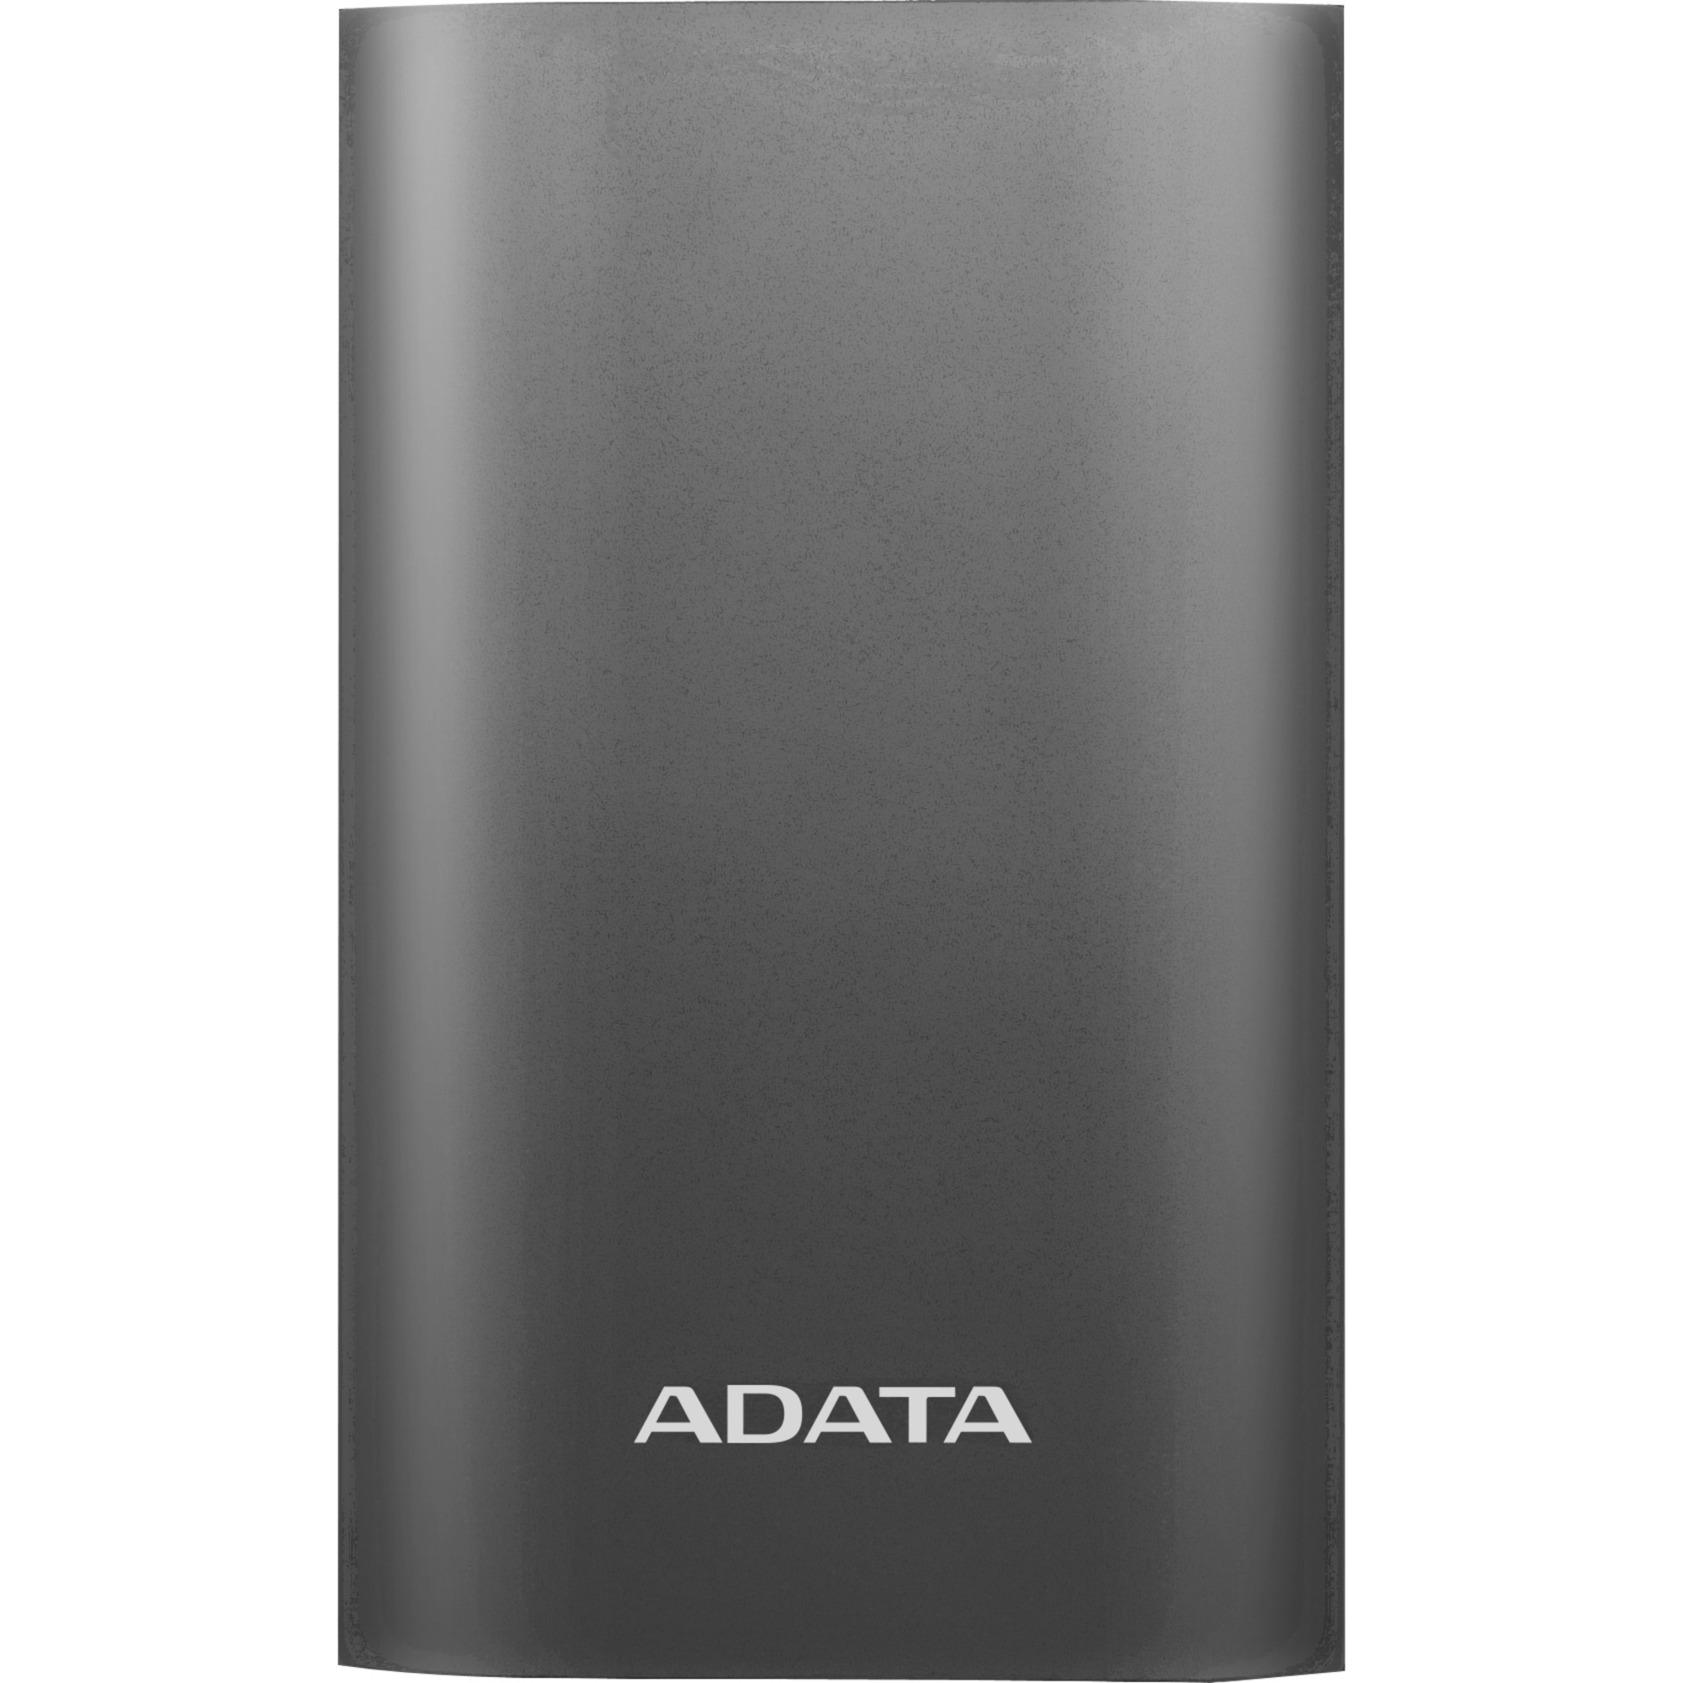 A10050QC batería externa Gris, Titanio Ión de litio 10050 mAh, Banco de potencia